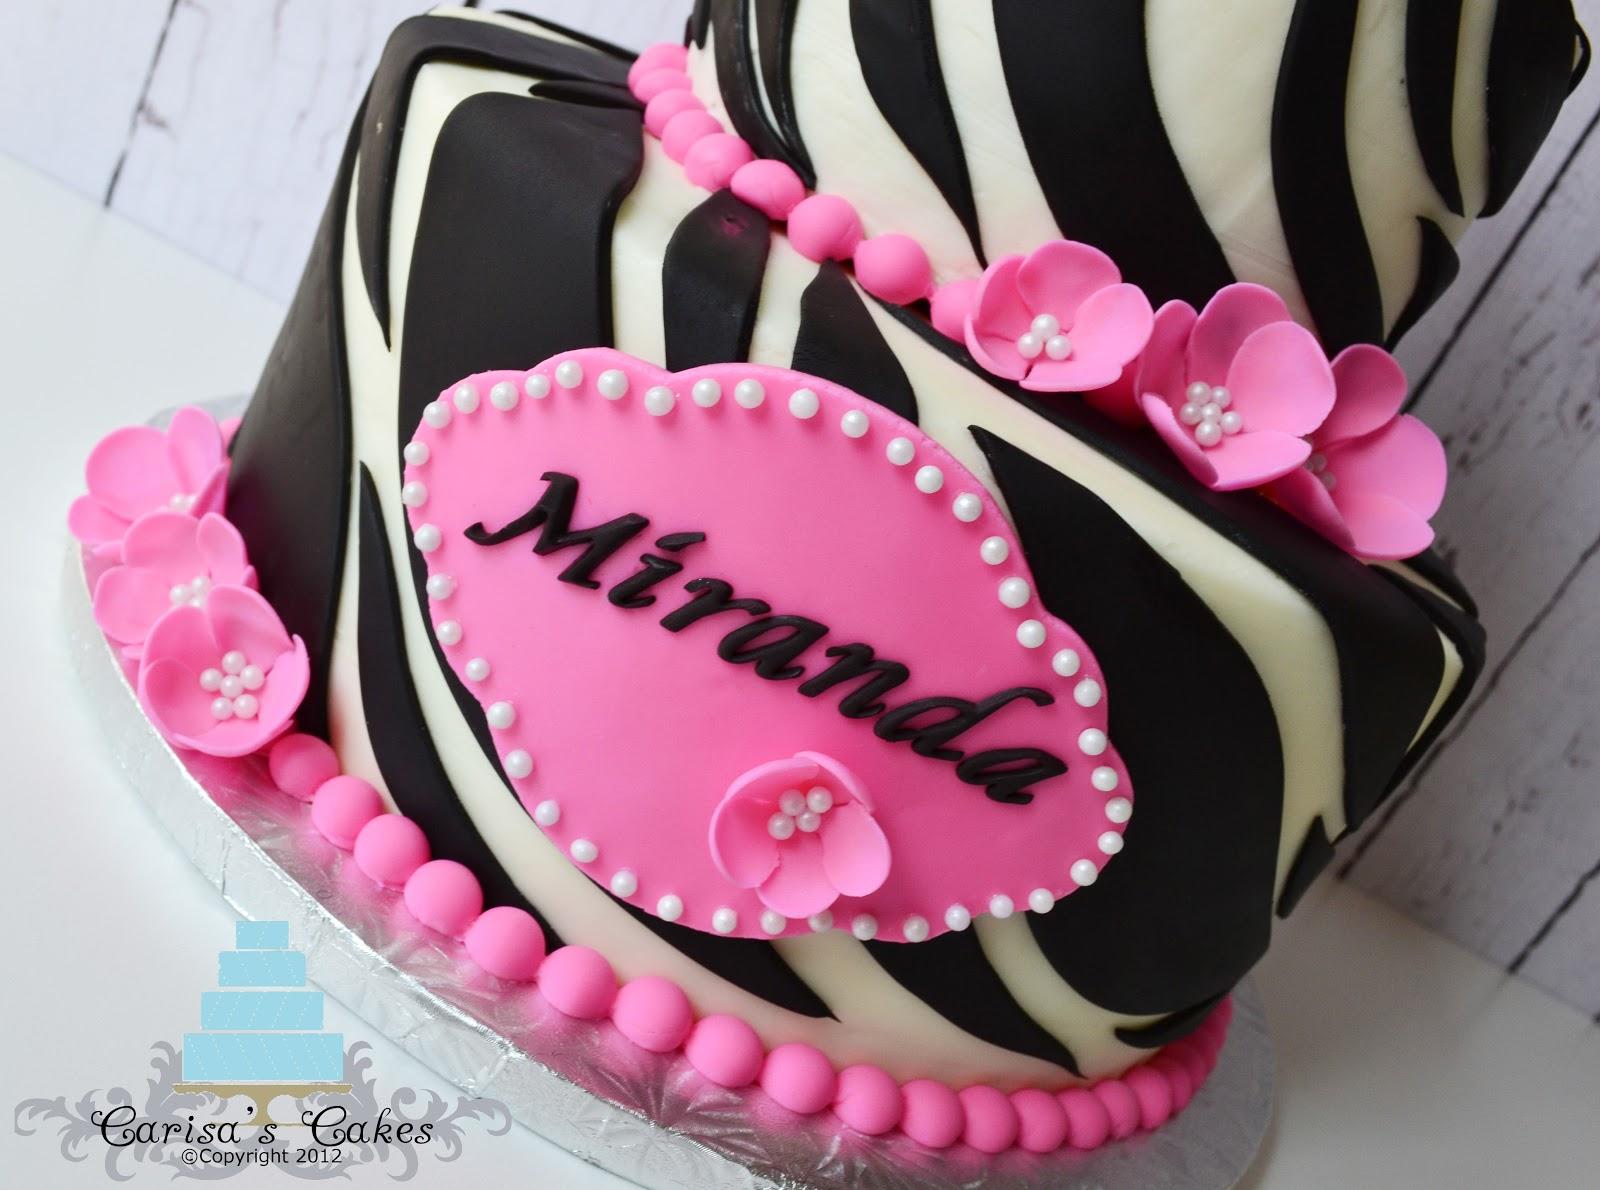 Carisas Cakes Two Tiered Zebra Birthday Cake